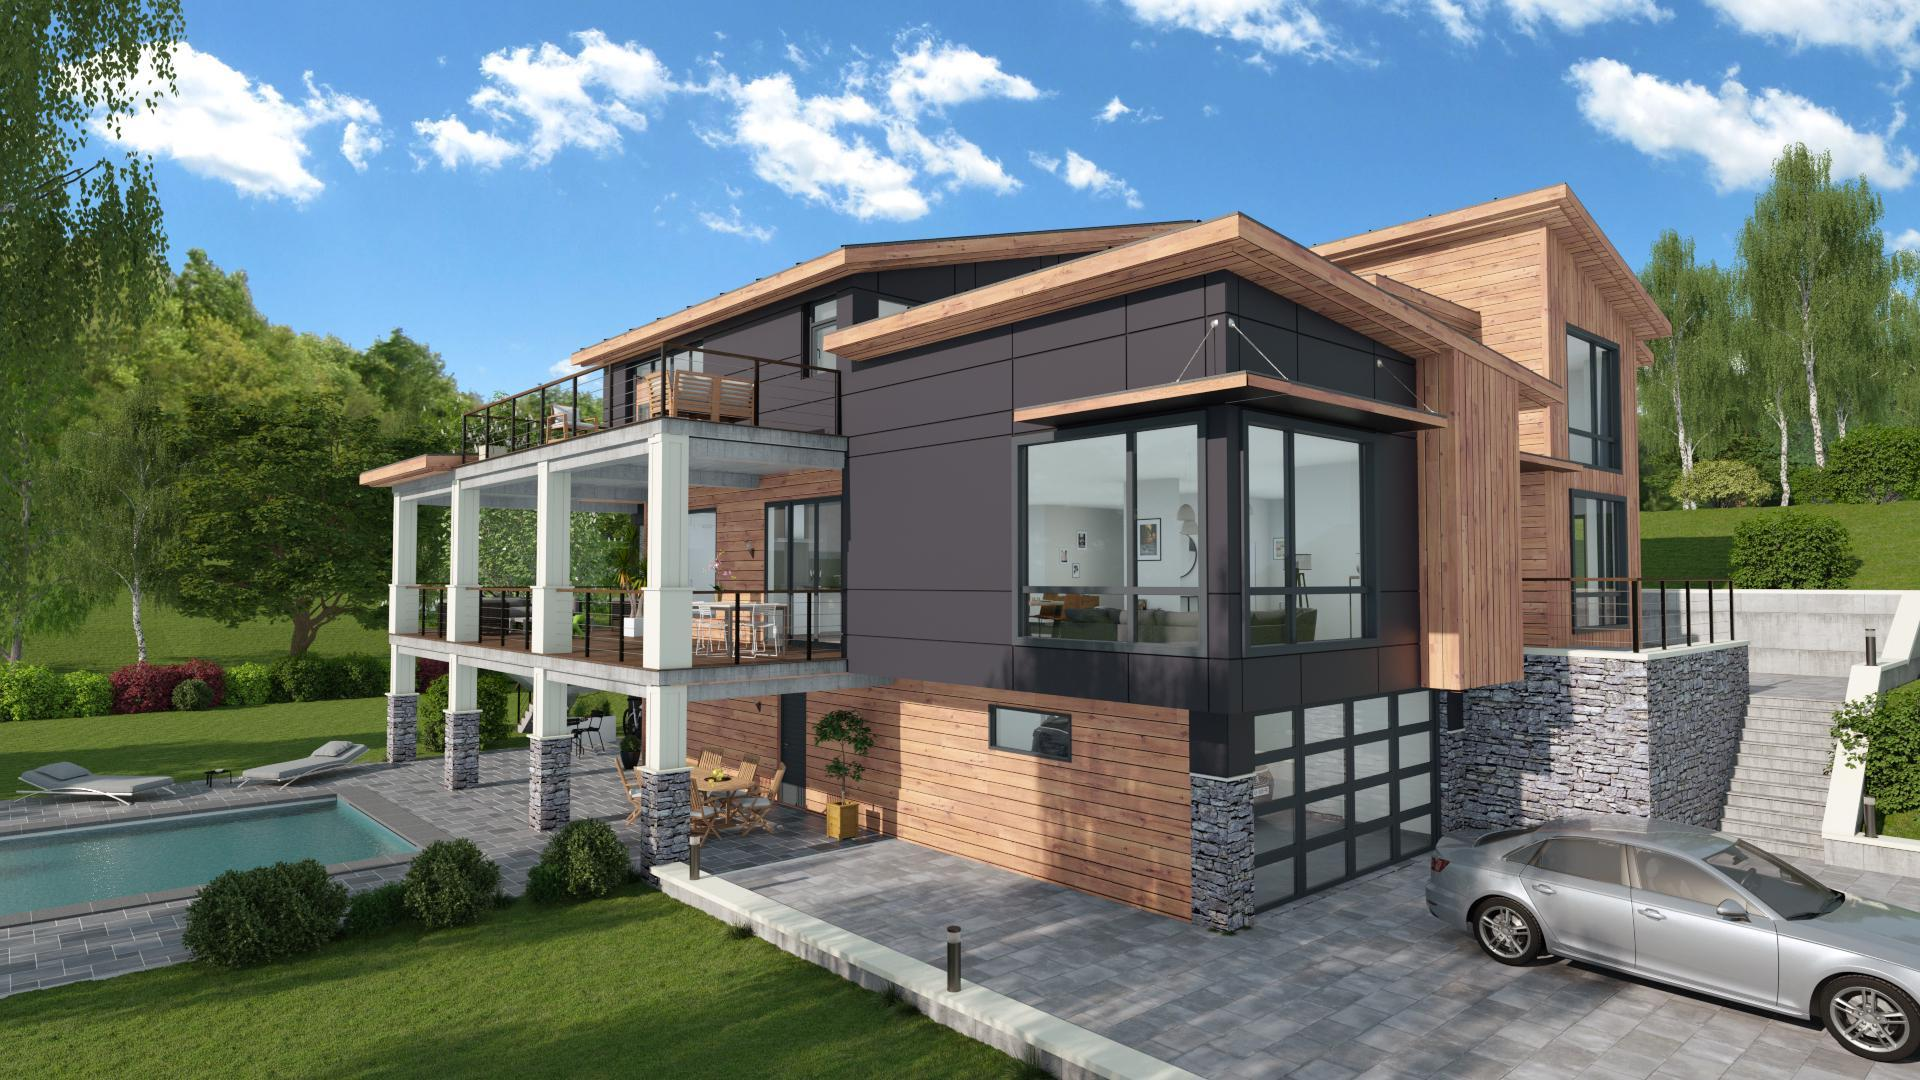 Review Cedreo: 3D Floor Plan and Home Design software - Appvizer